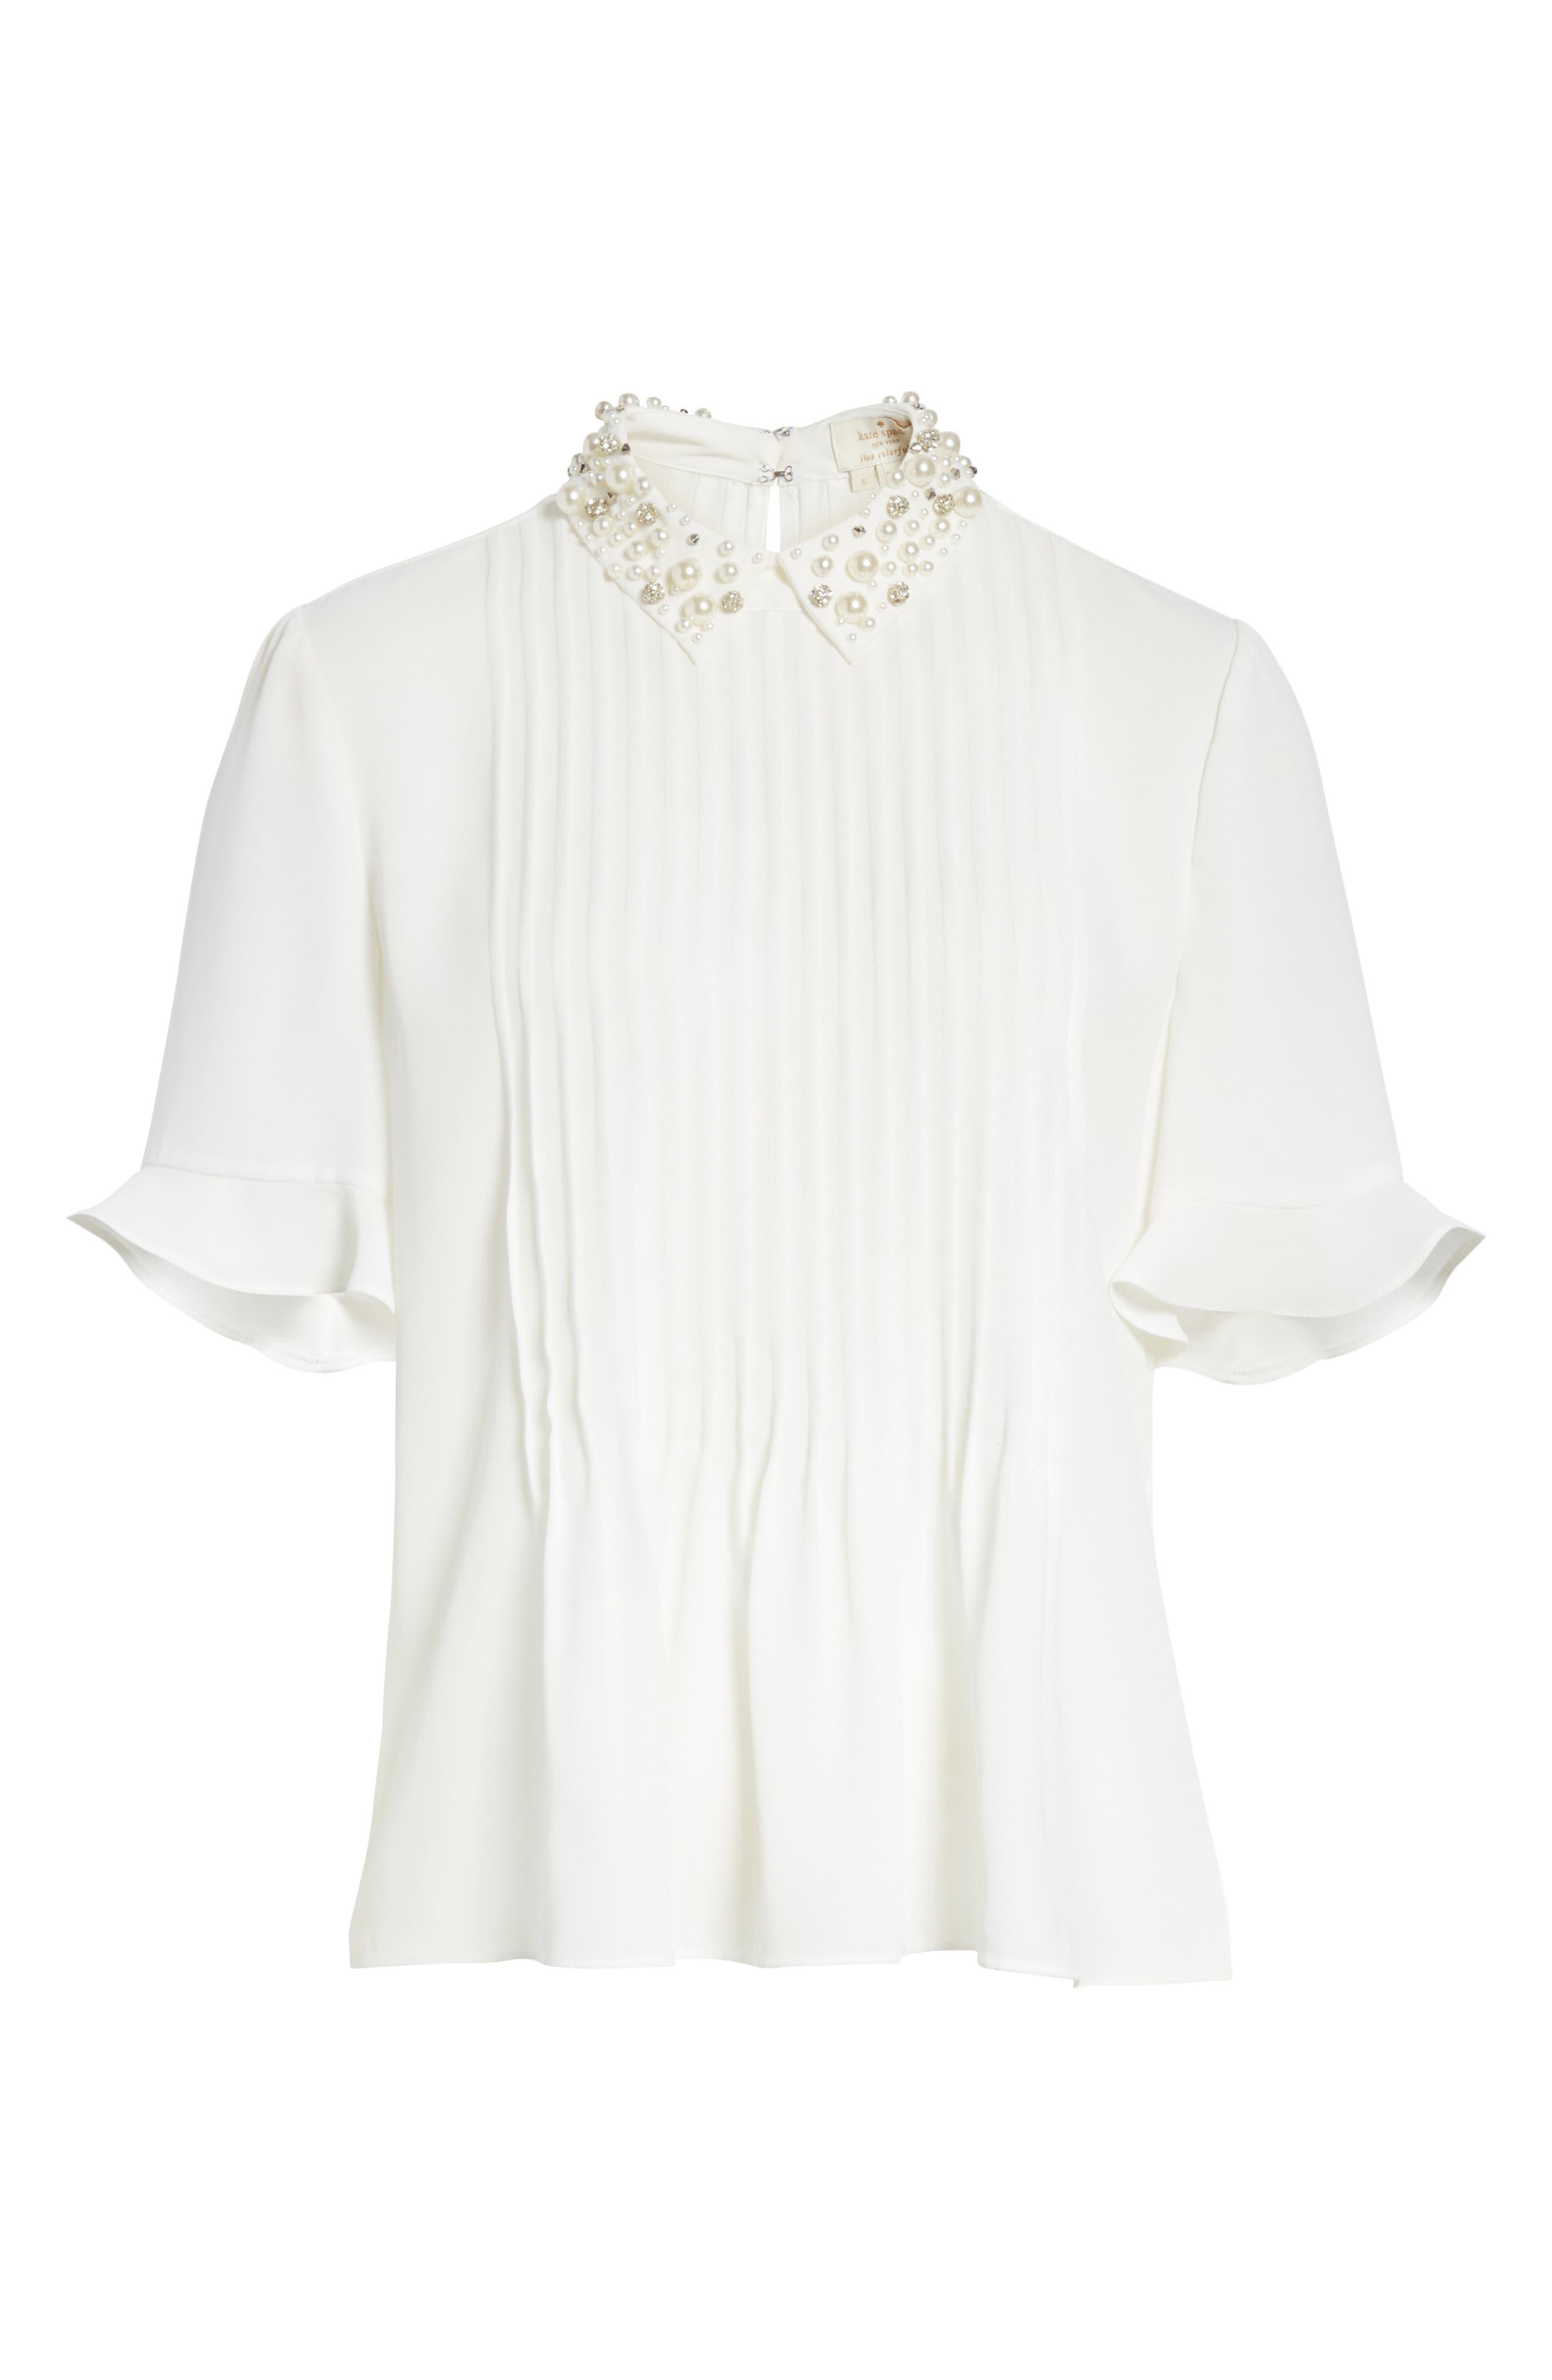 embellished collar shirt,                             Alternate thumbnail 6, color,                             292